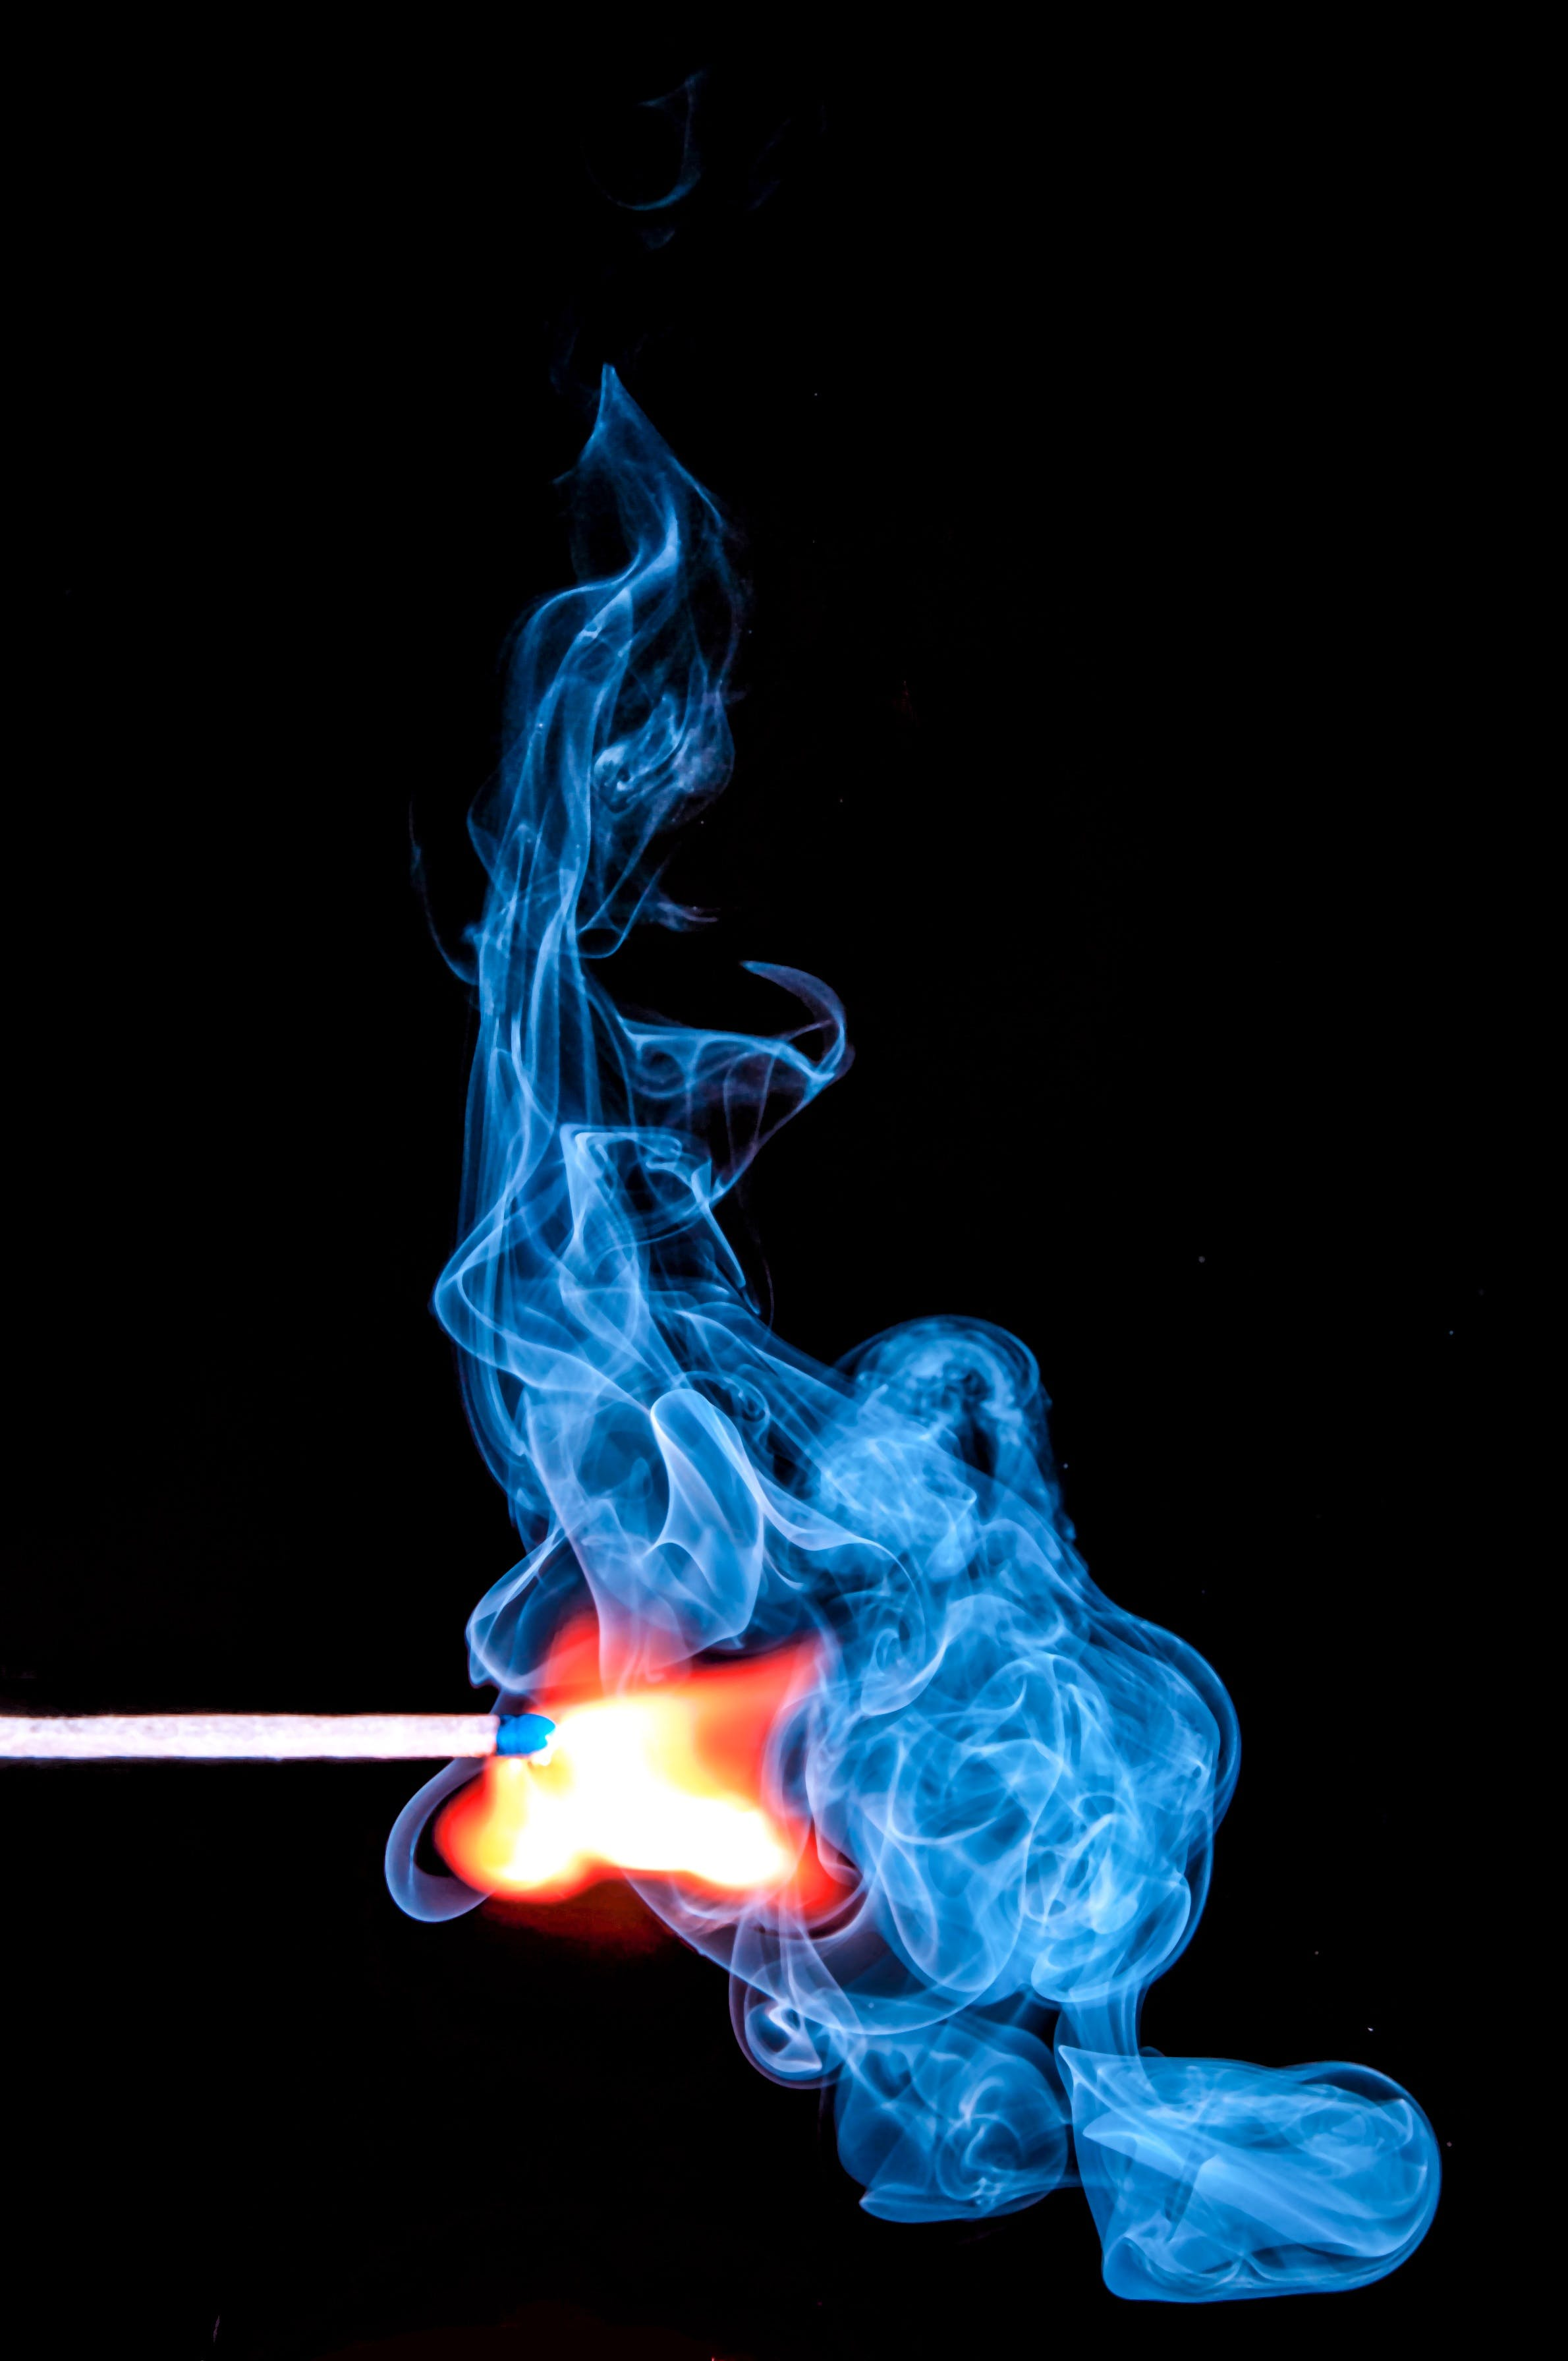 cremar, emparellat, flama